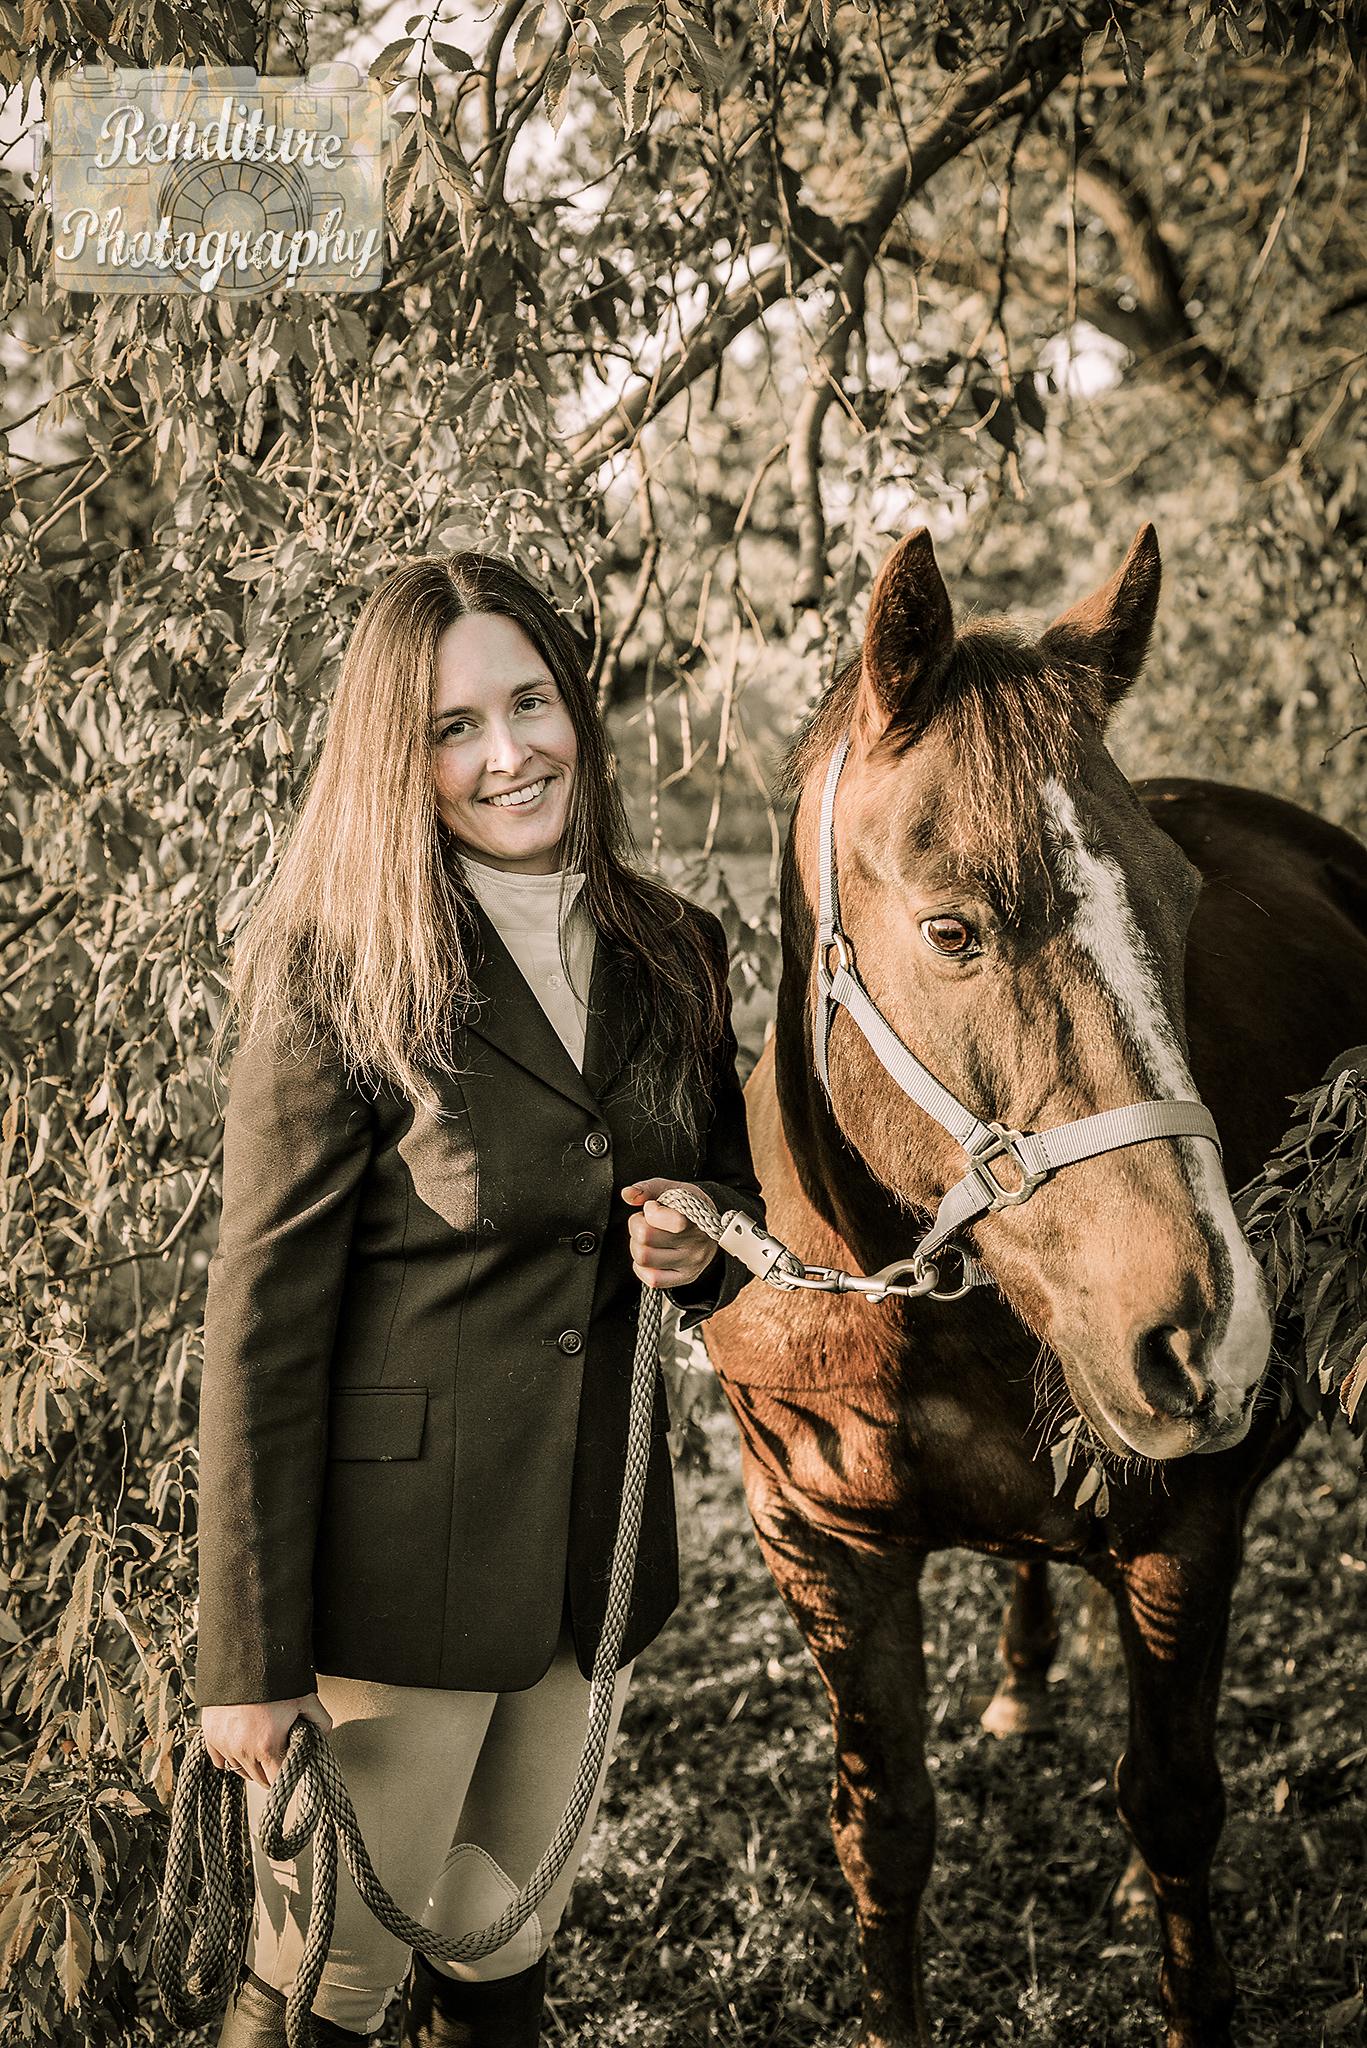 Saskatoon,Family,Renditure,Photography,Photographer,Portrait,Pregnancy,Saskatchewan,Pet,Horse